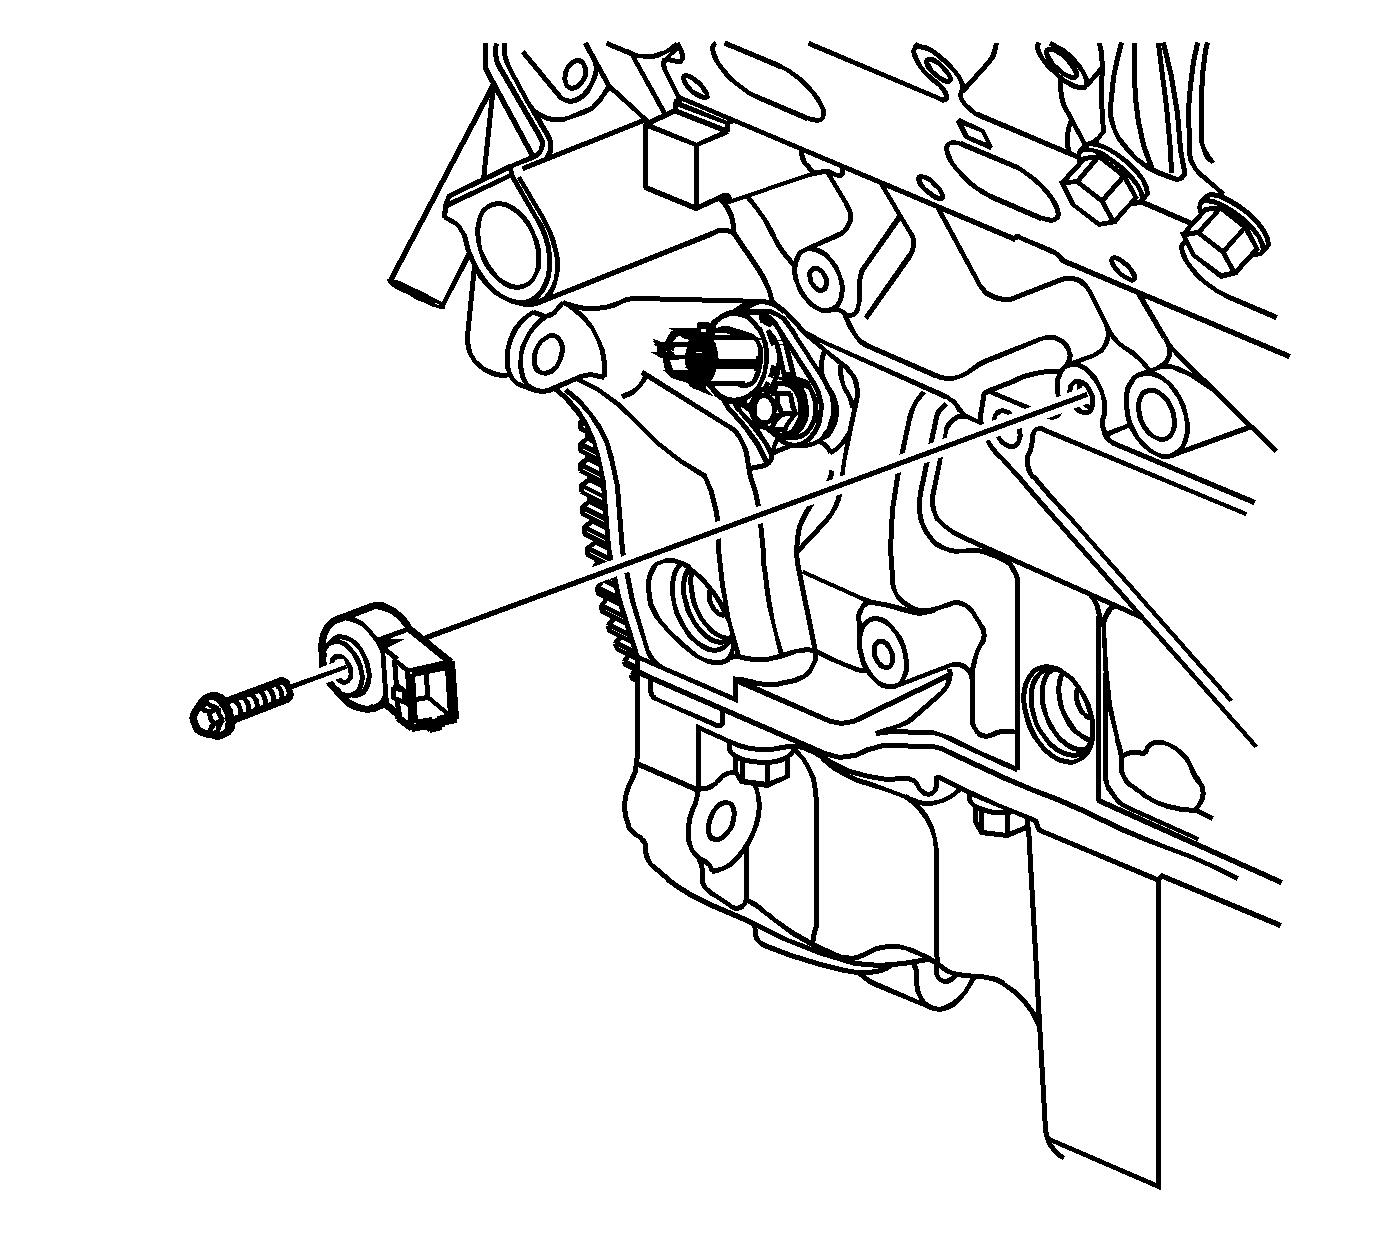 honda o2 sensor wiring diagram rm 2027  2000 honda accord oxygen sensor location wiring diagram honda civic o2 sensor wiring diagram 2000 honda accord oxygen sensor